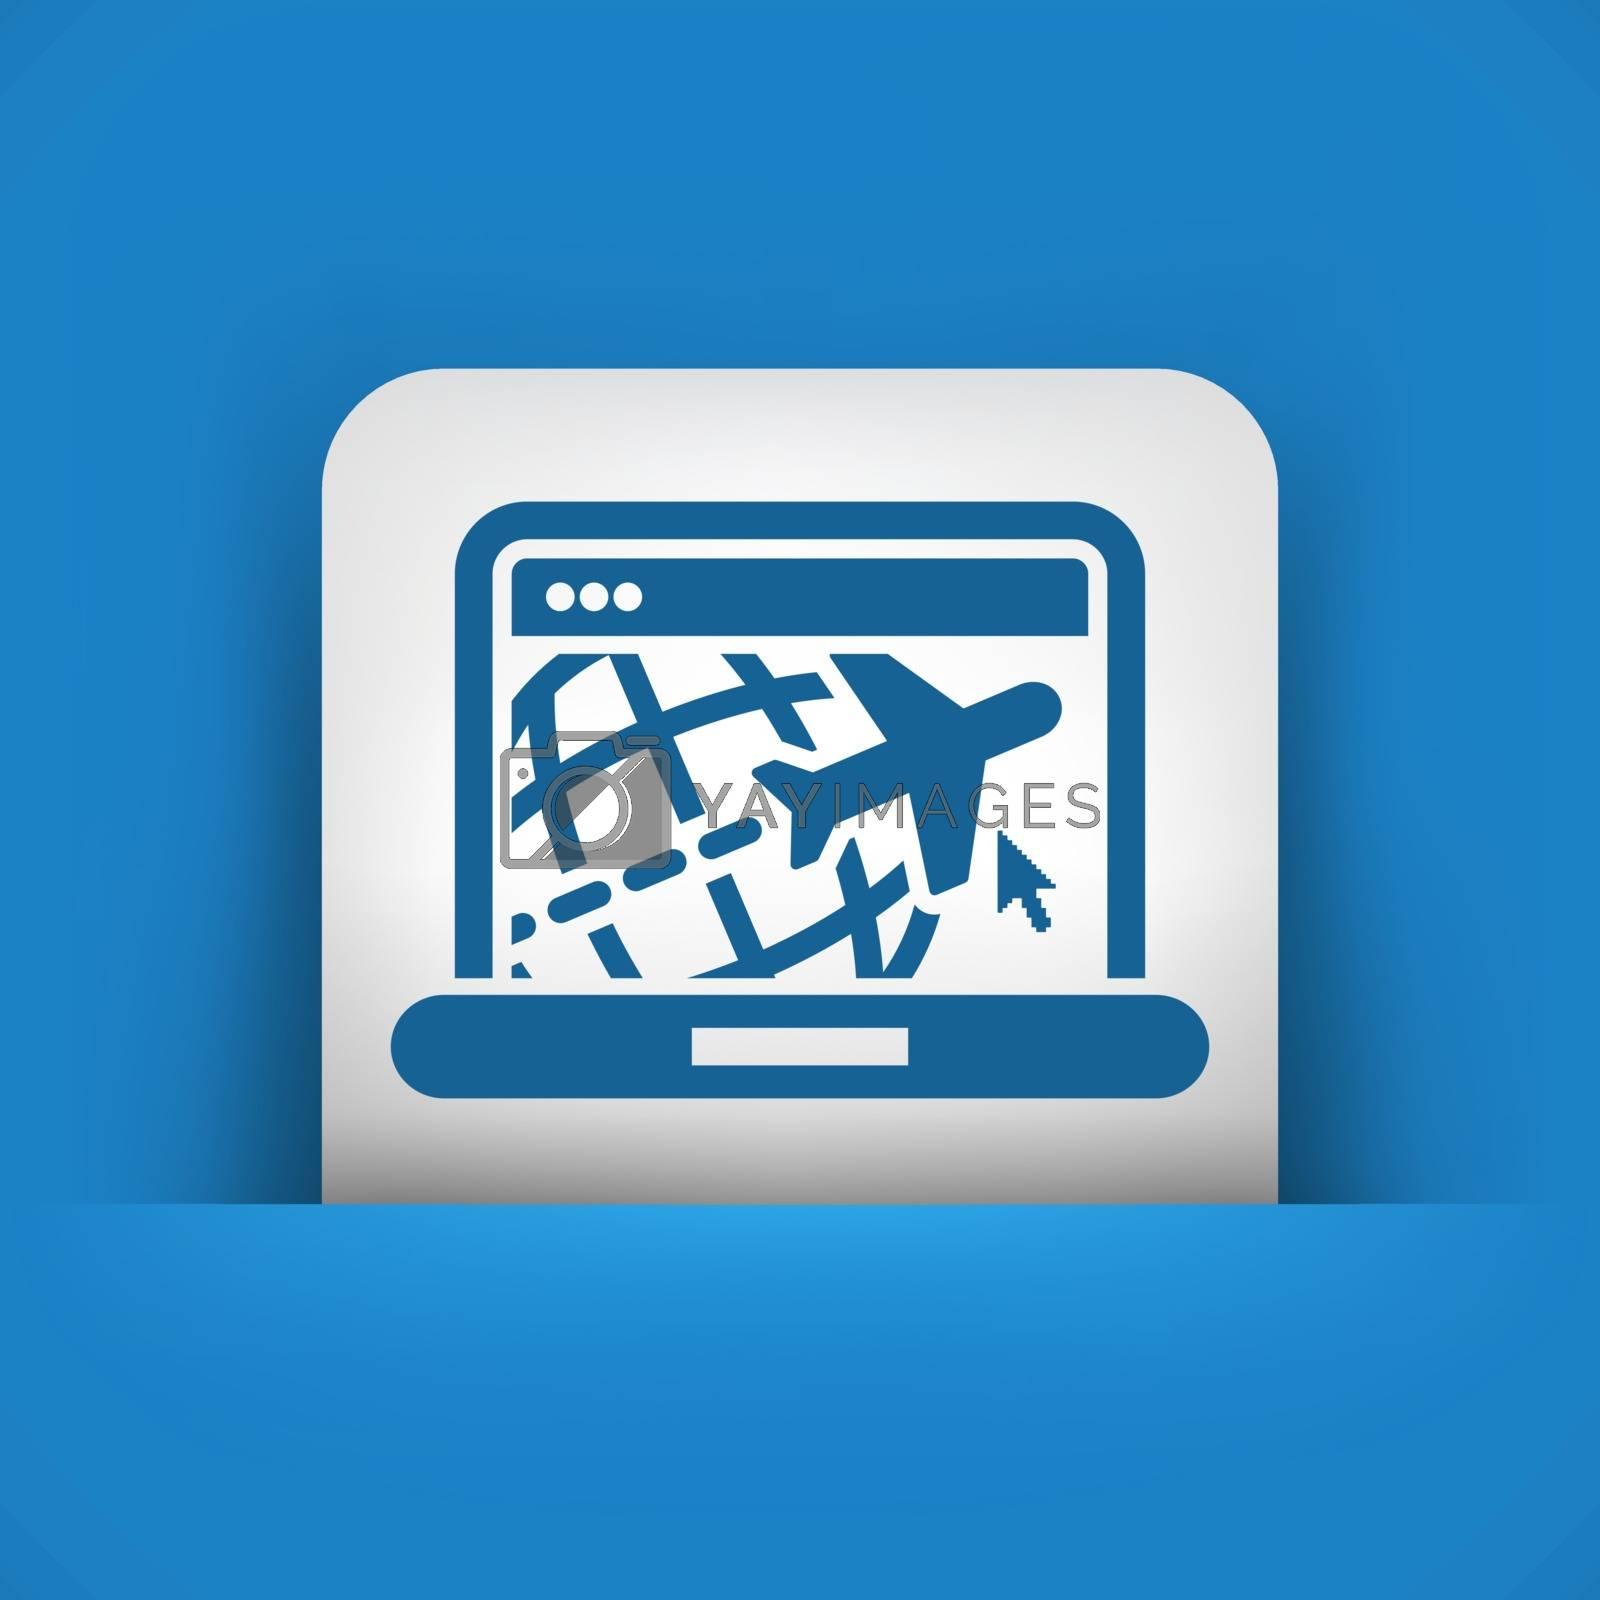 Illustration of travel web agency icon